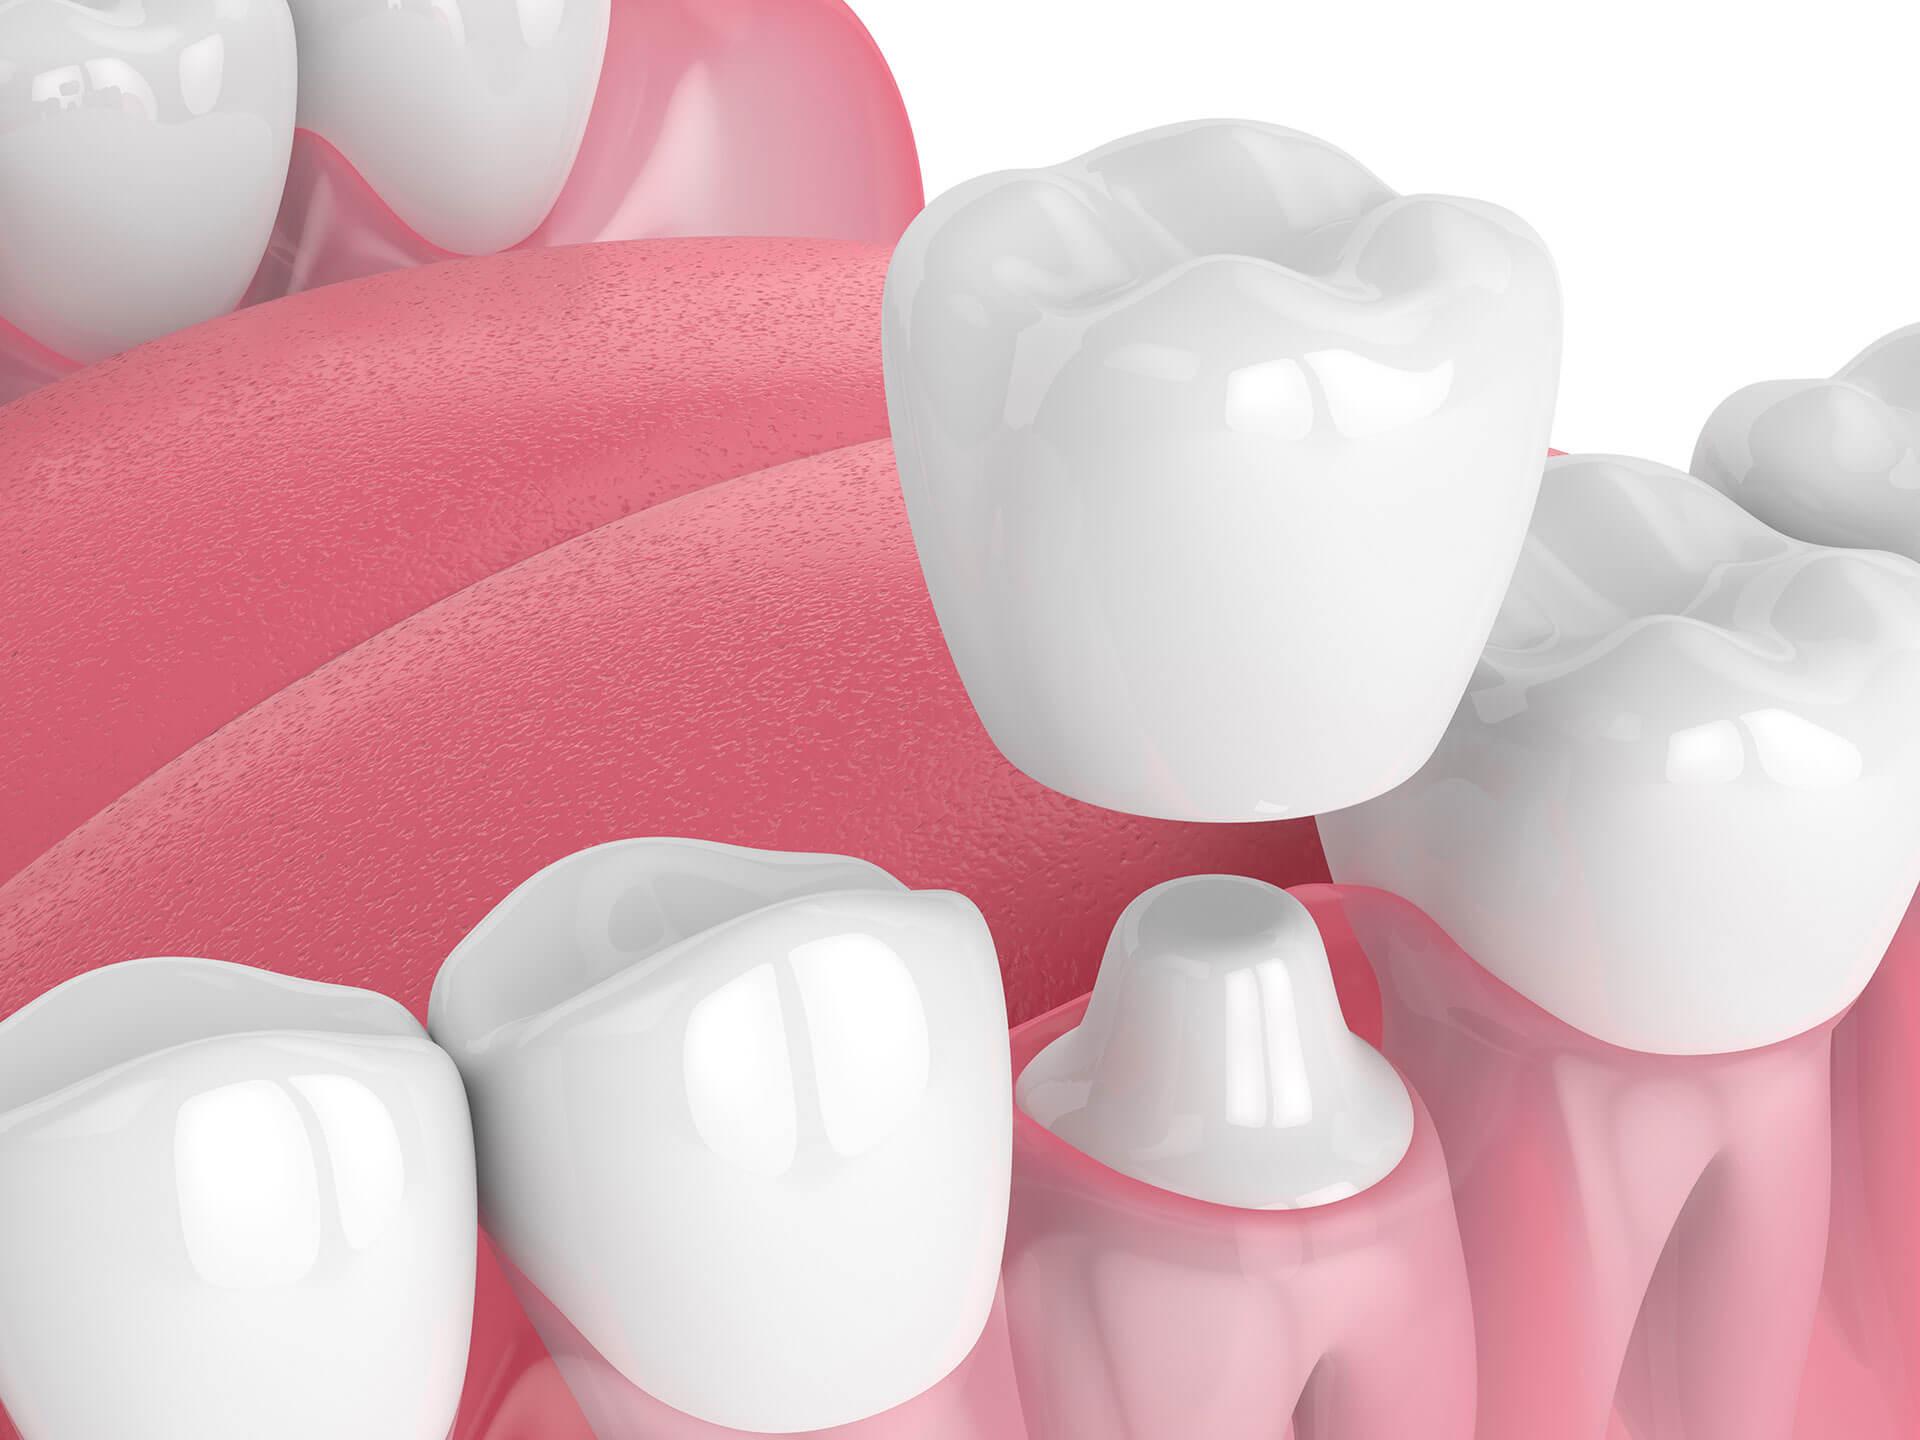 dental crowns san jose ca